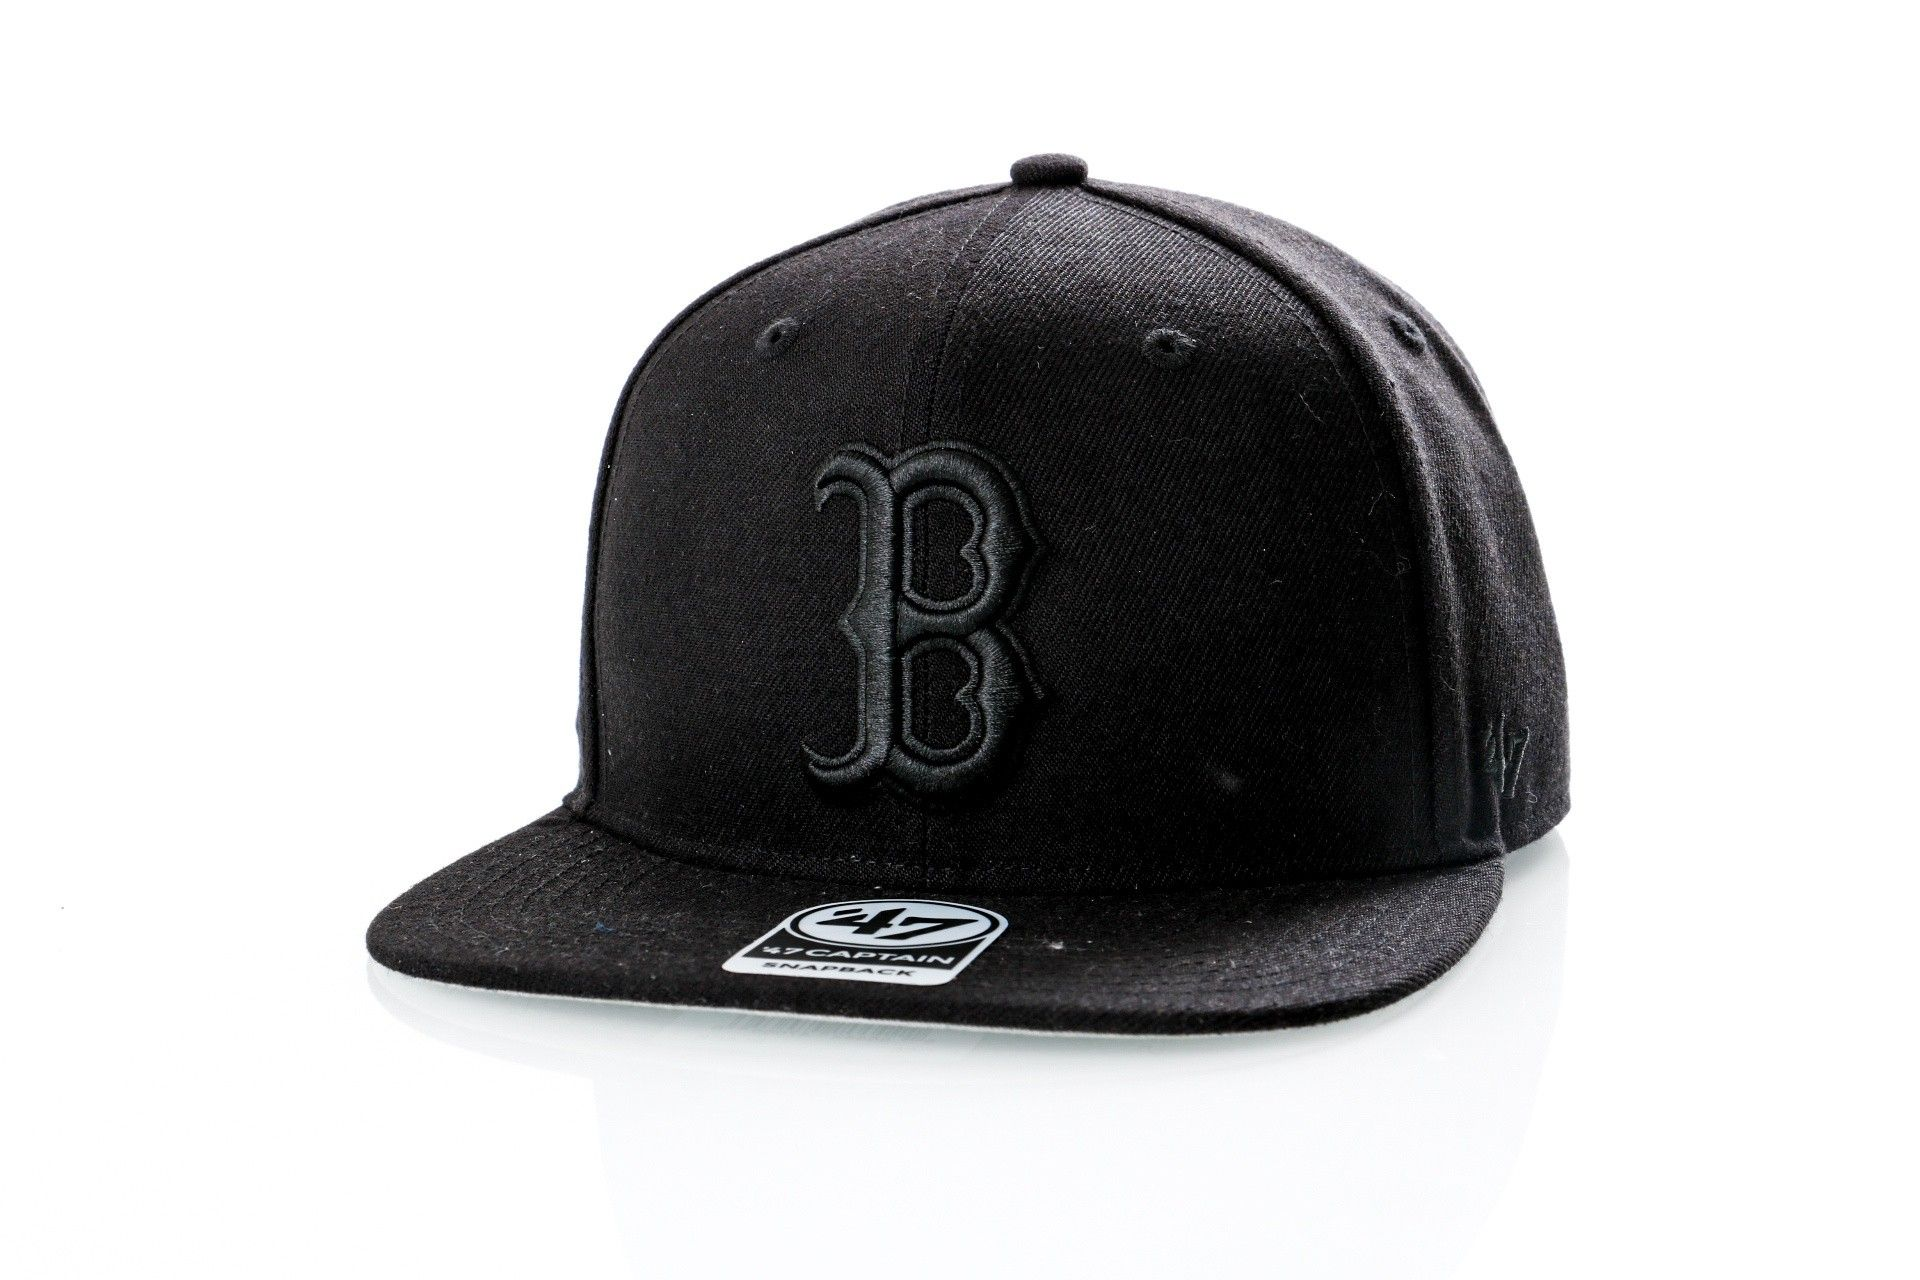 Afbeelding van 47 Brand B-Srs02Wbp-Bka Black Mlb Boston Red Sox